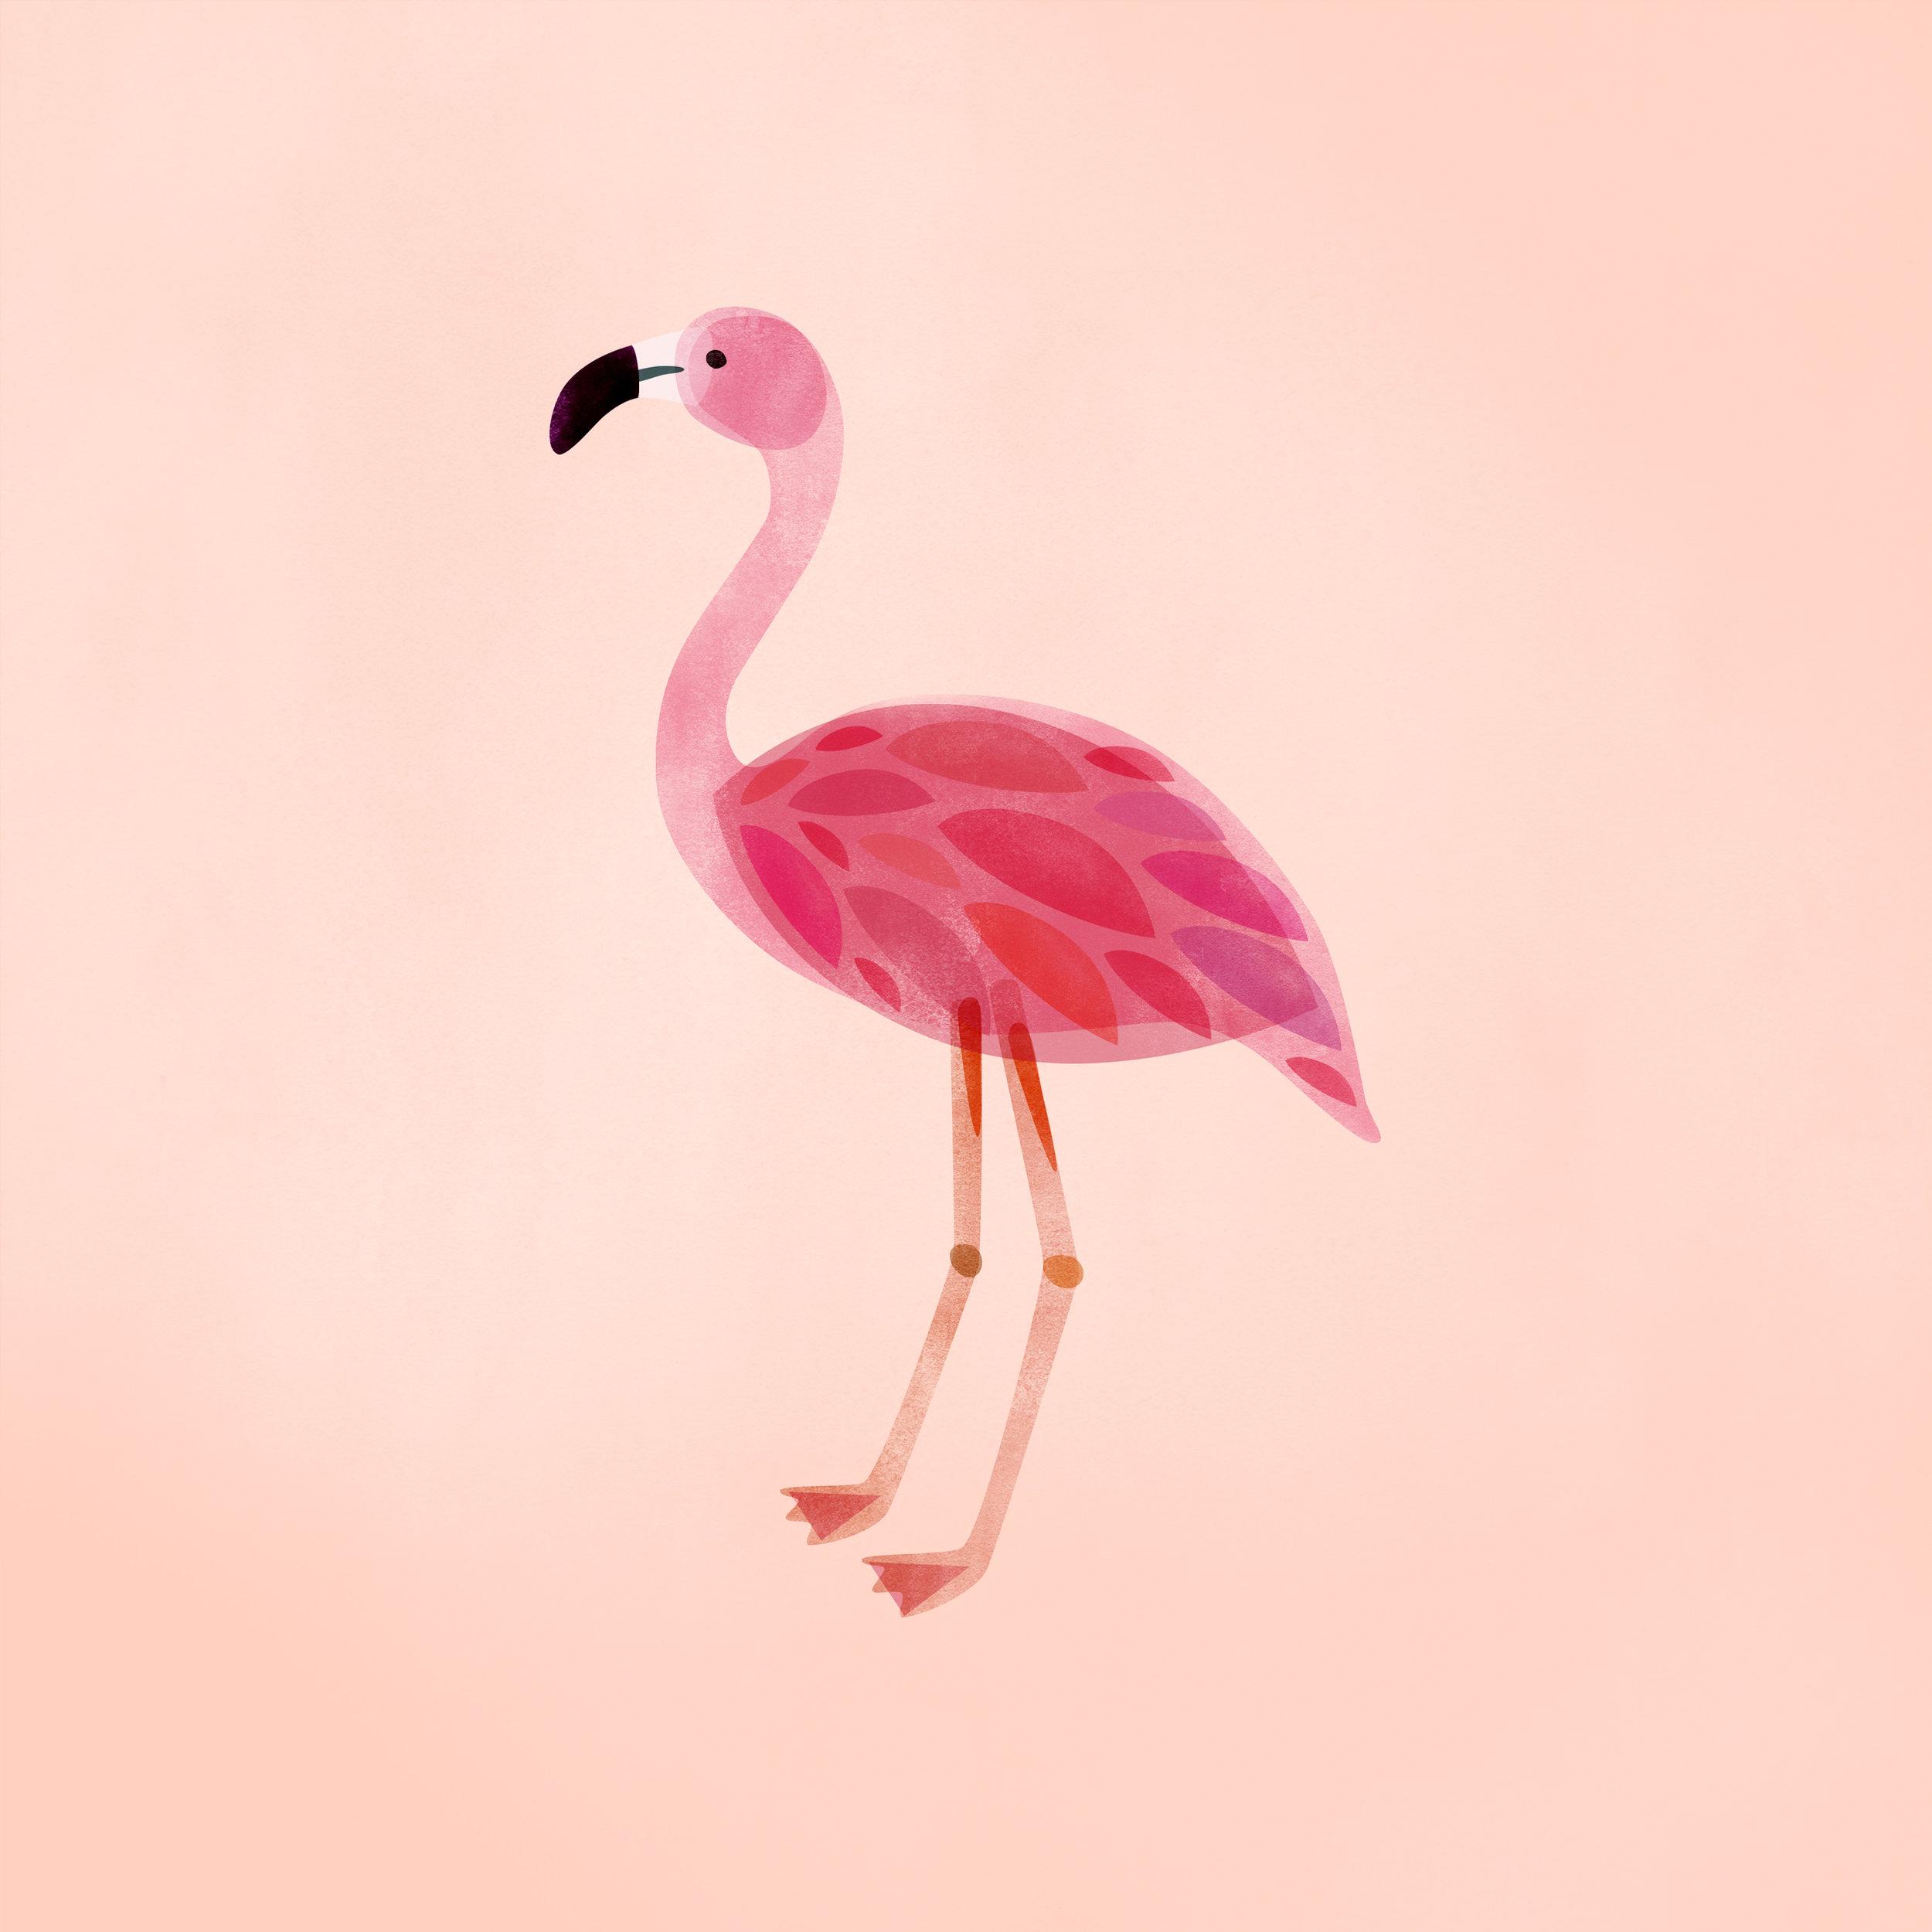 flamingo2 1.jpg